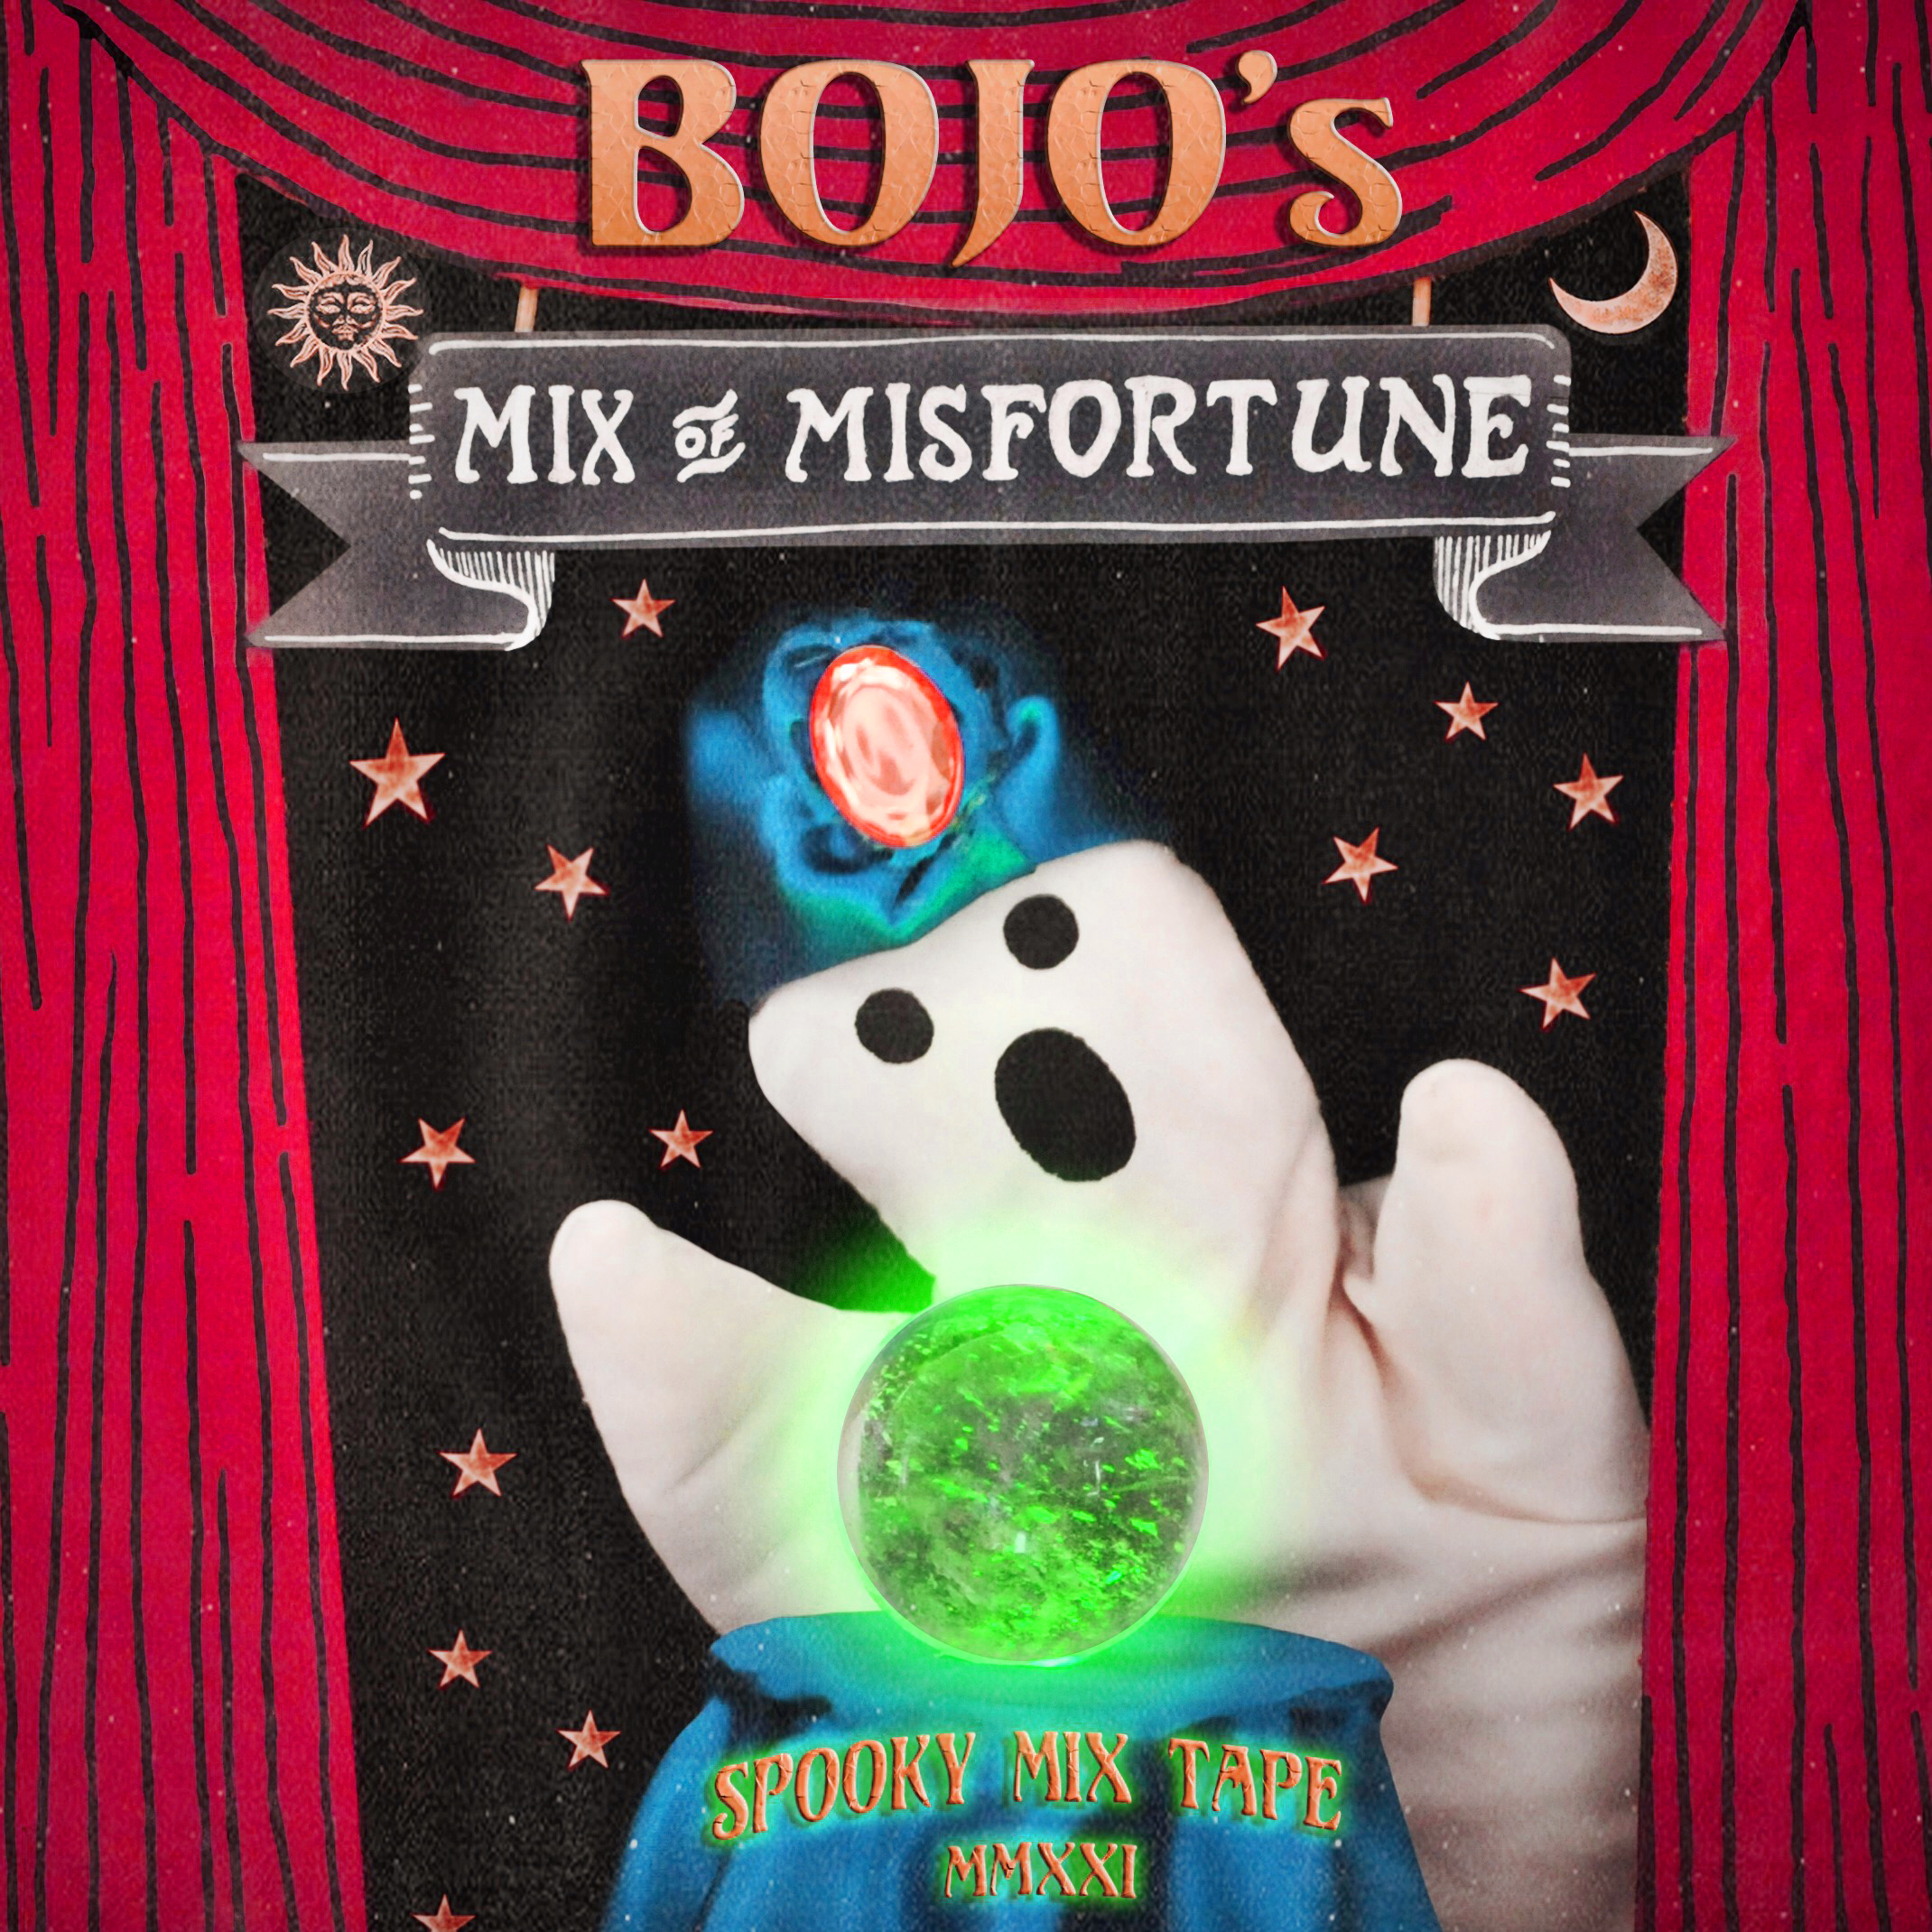 BoJo's Mix of Misfortune